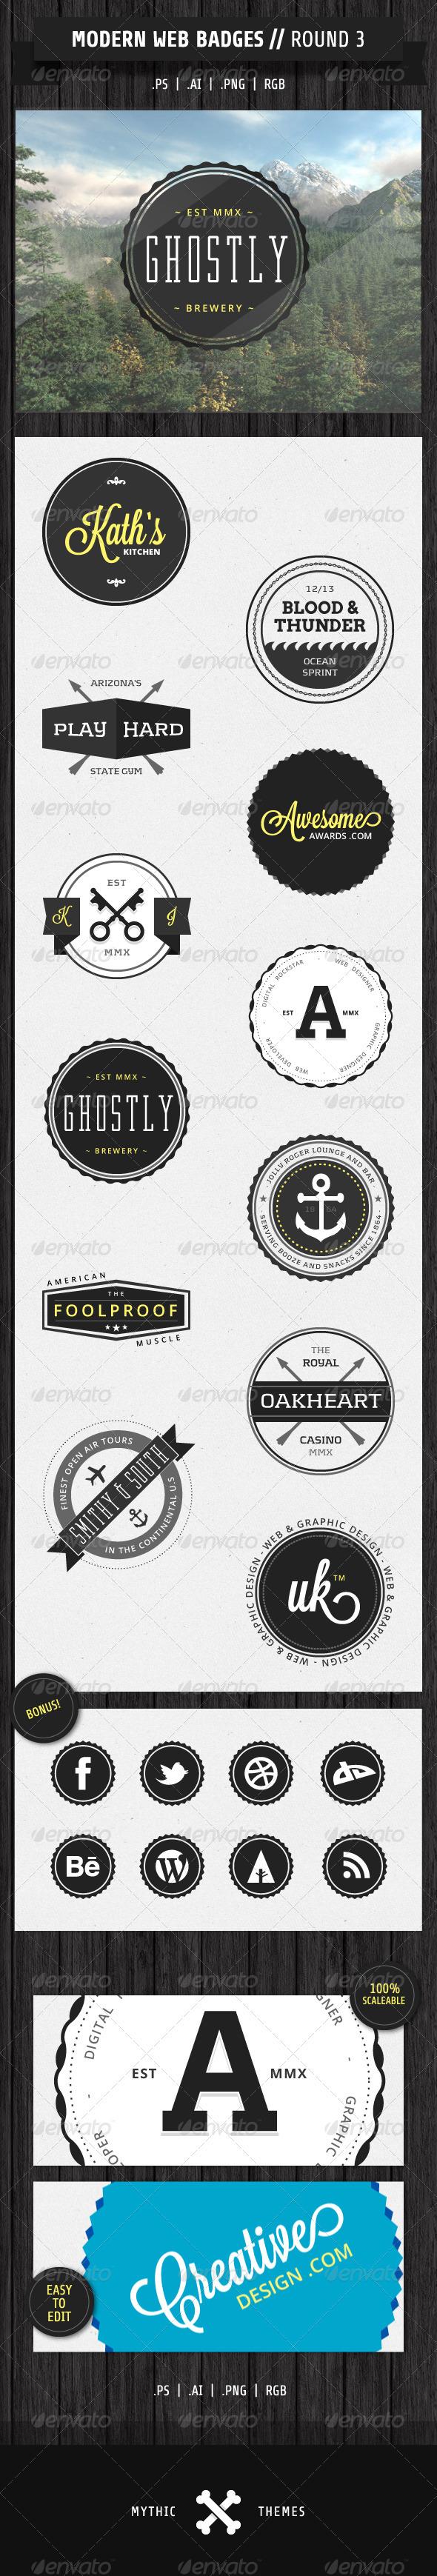 GraphicRiver Modern Web Badges Round 3 1902949